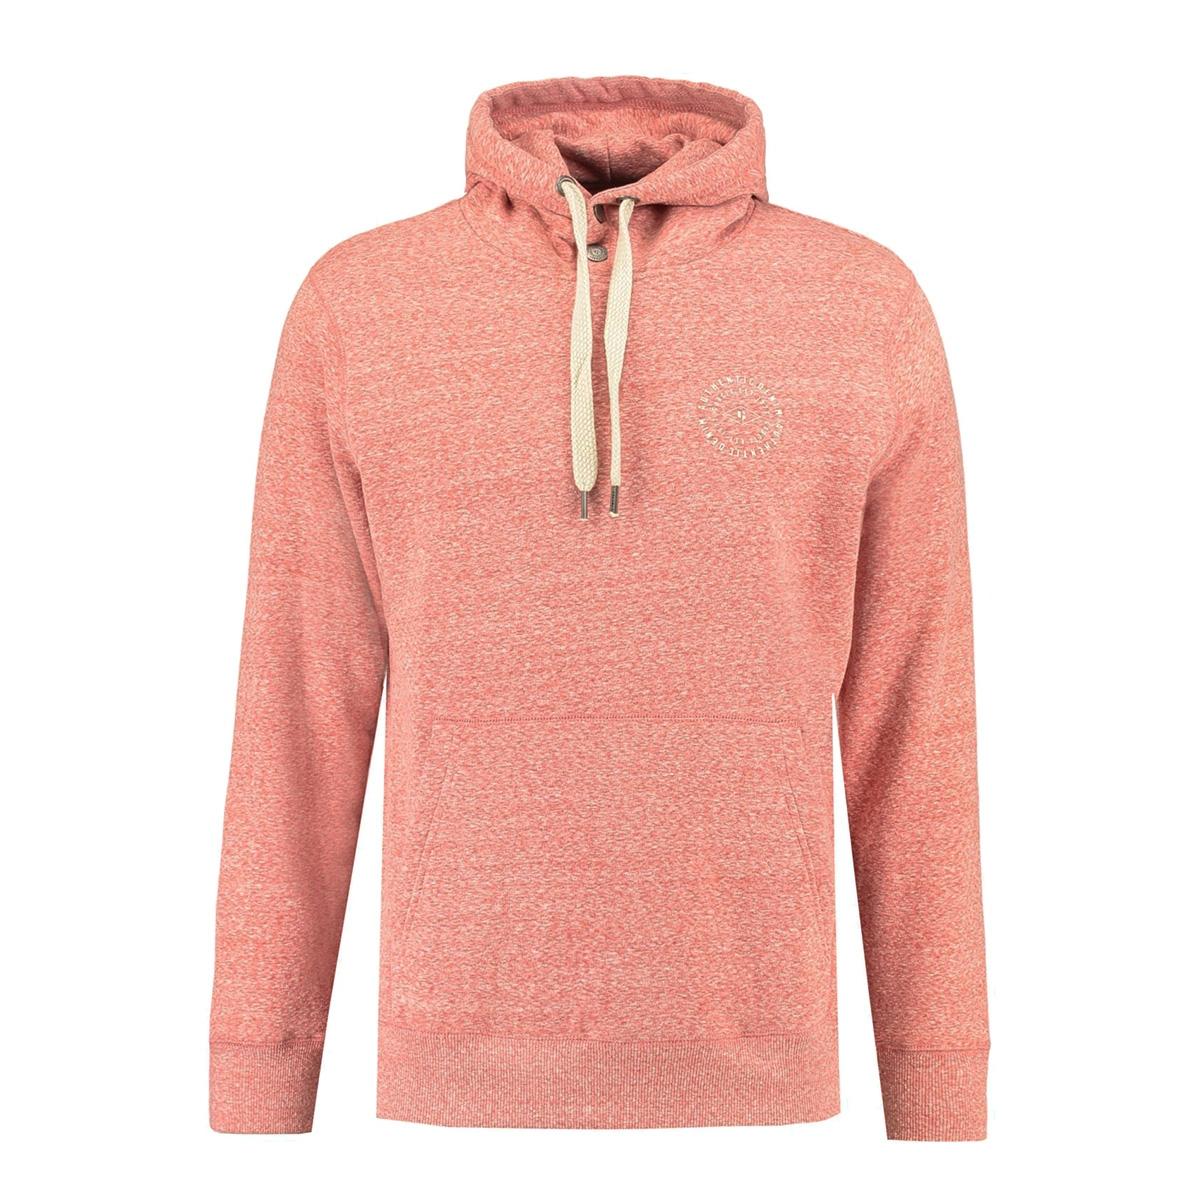 gs910120 garcia sweater 2706 dark apricot